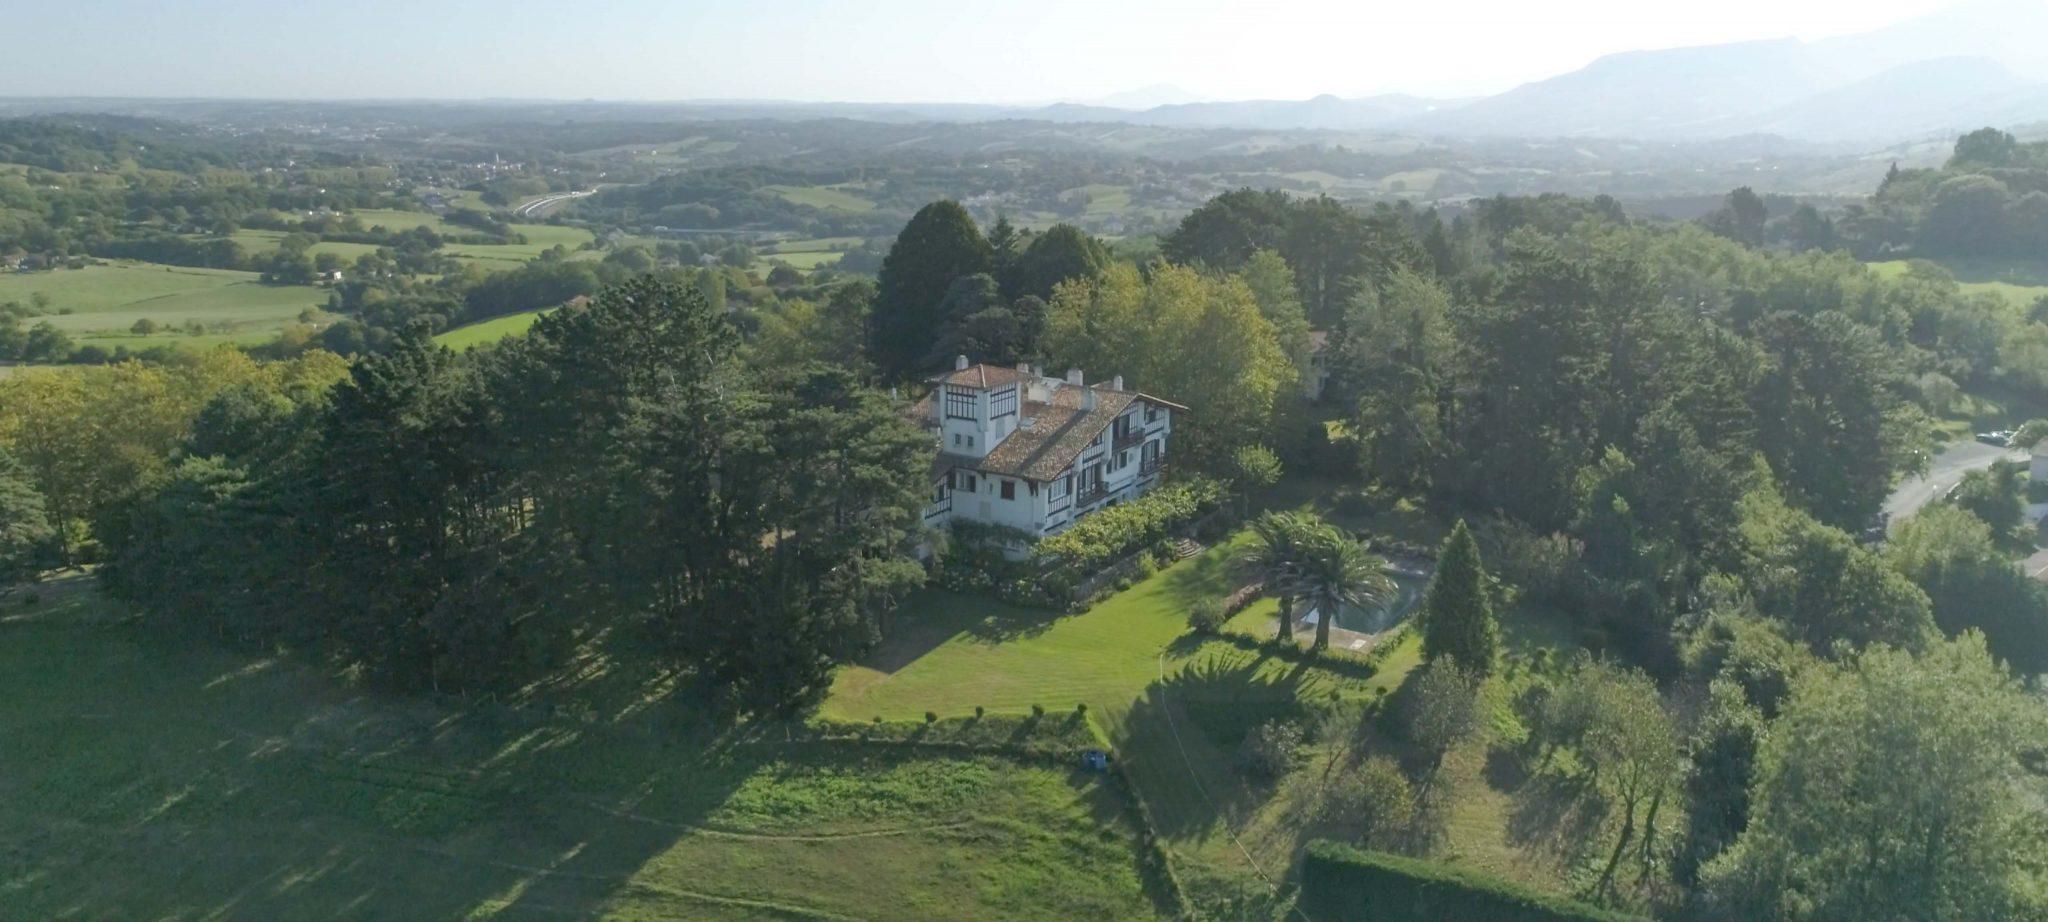 drone-immobilier-mringalss-films-pays-basque-anglet-bayonne-biarritz-pierre-frechou